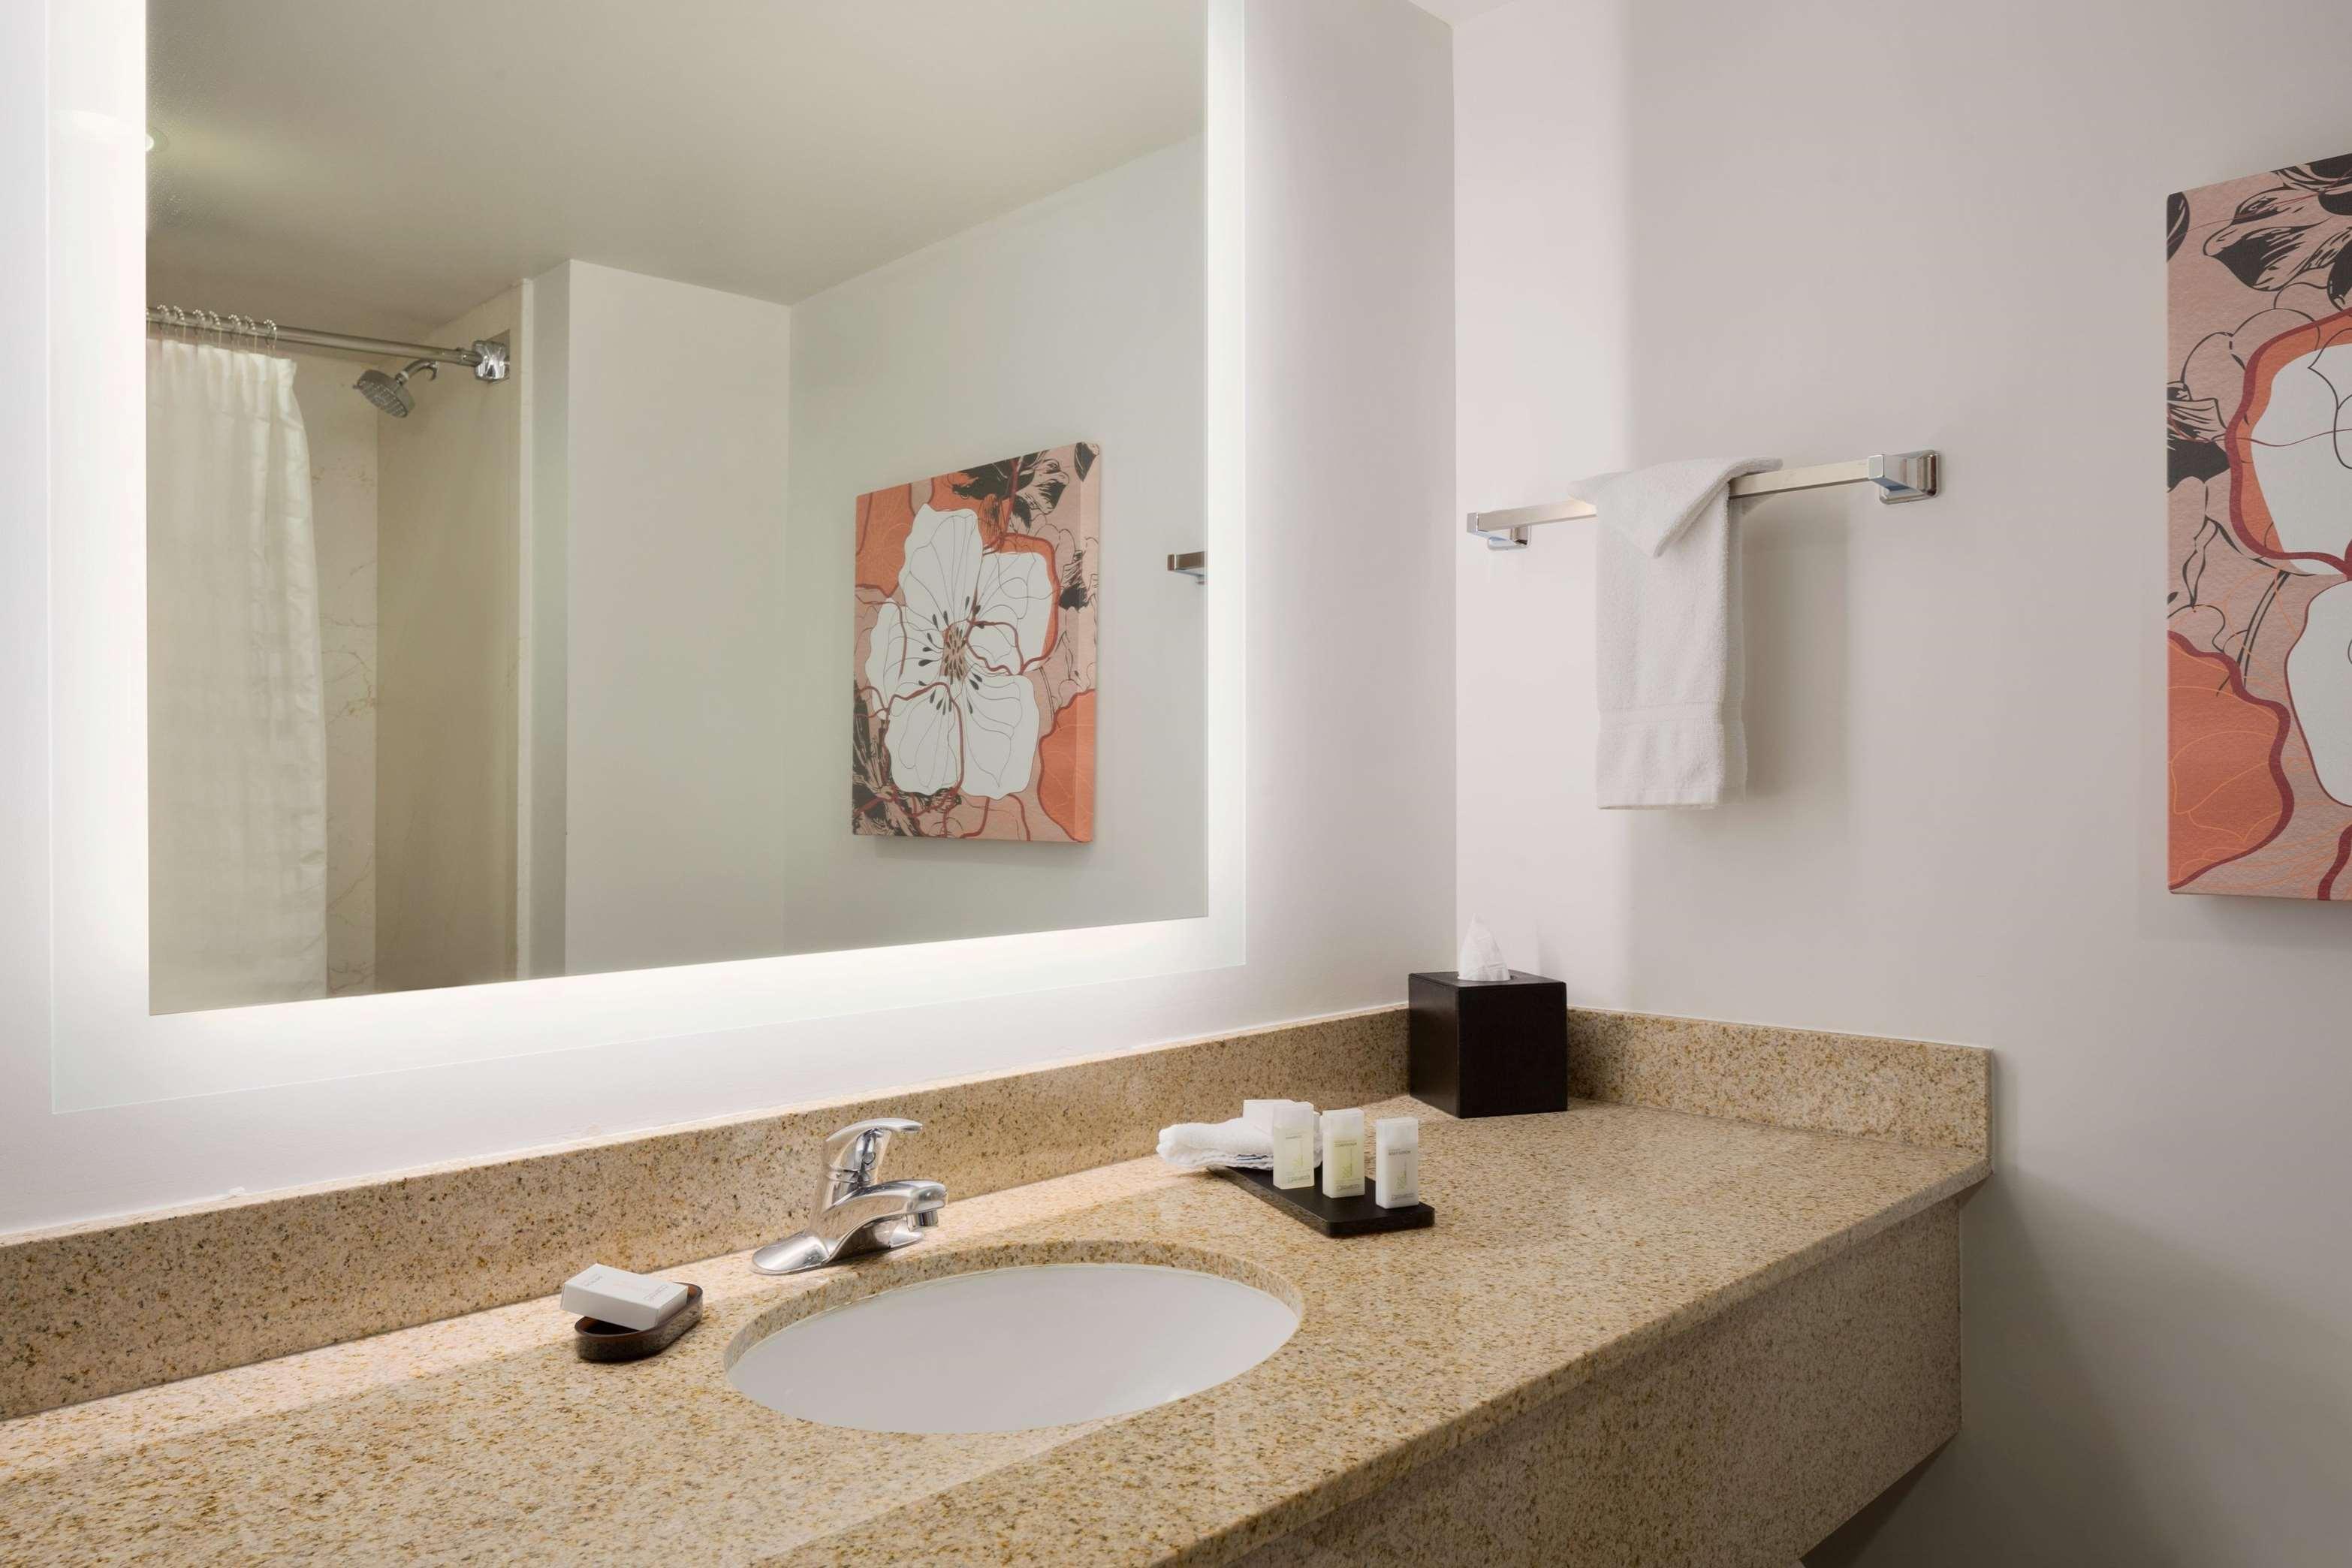 Embassy Suites by Hilton Denver International Airport image 28